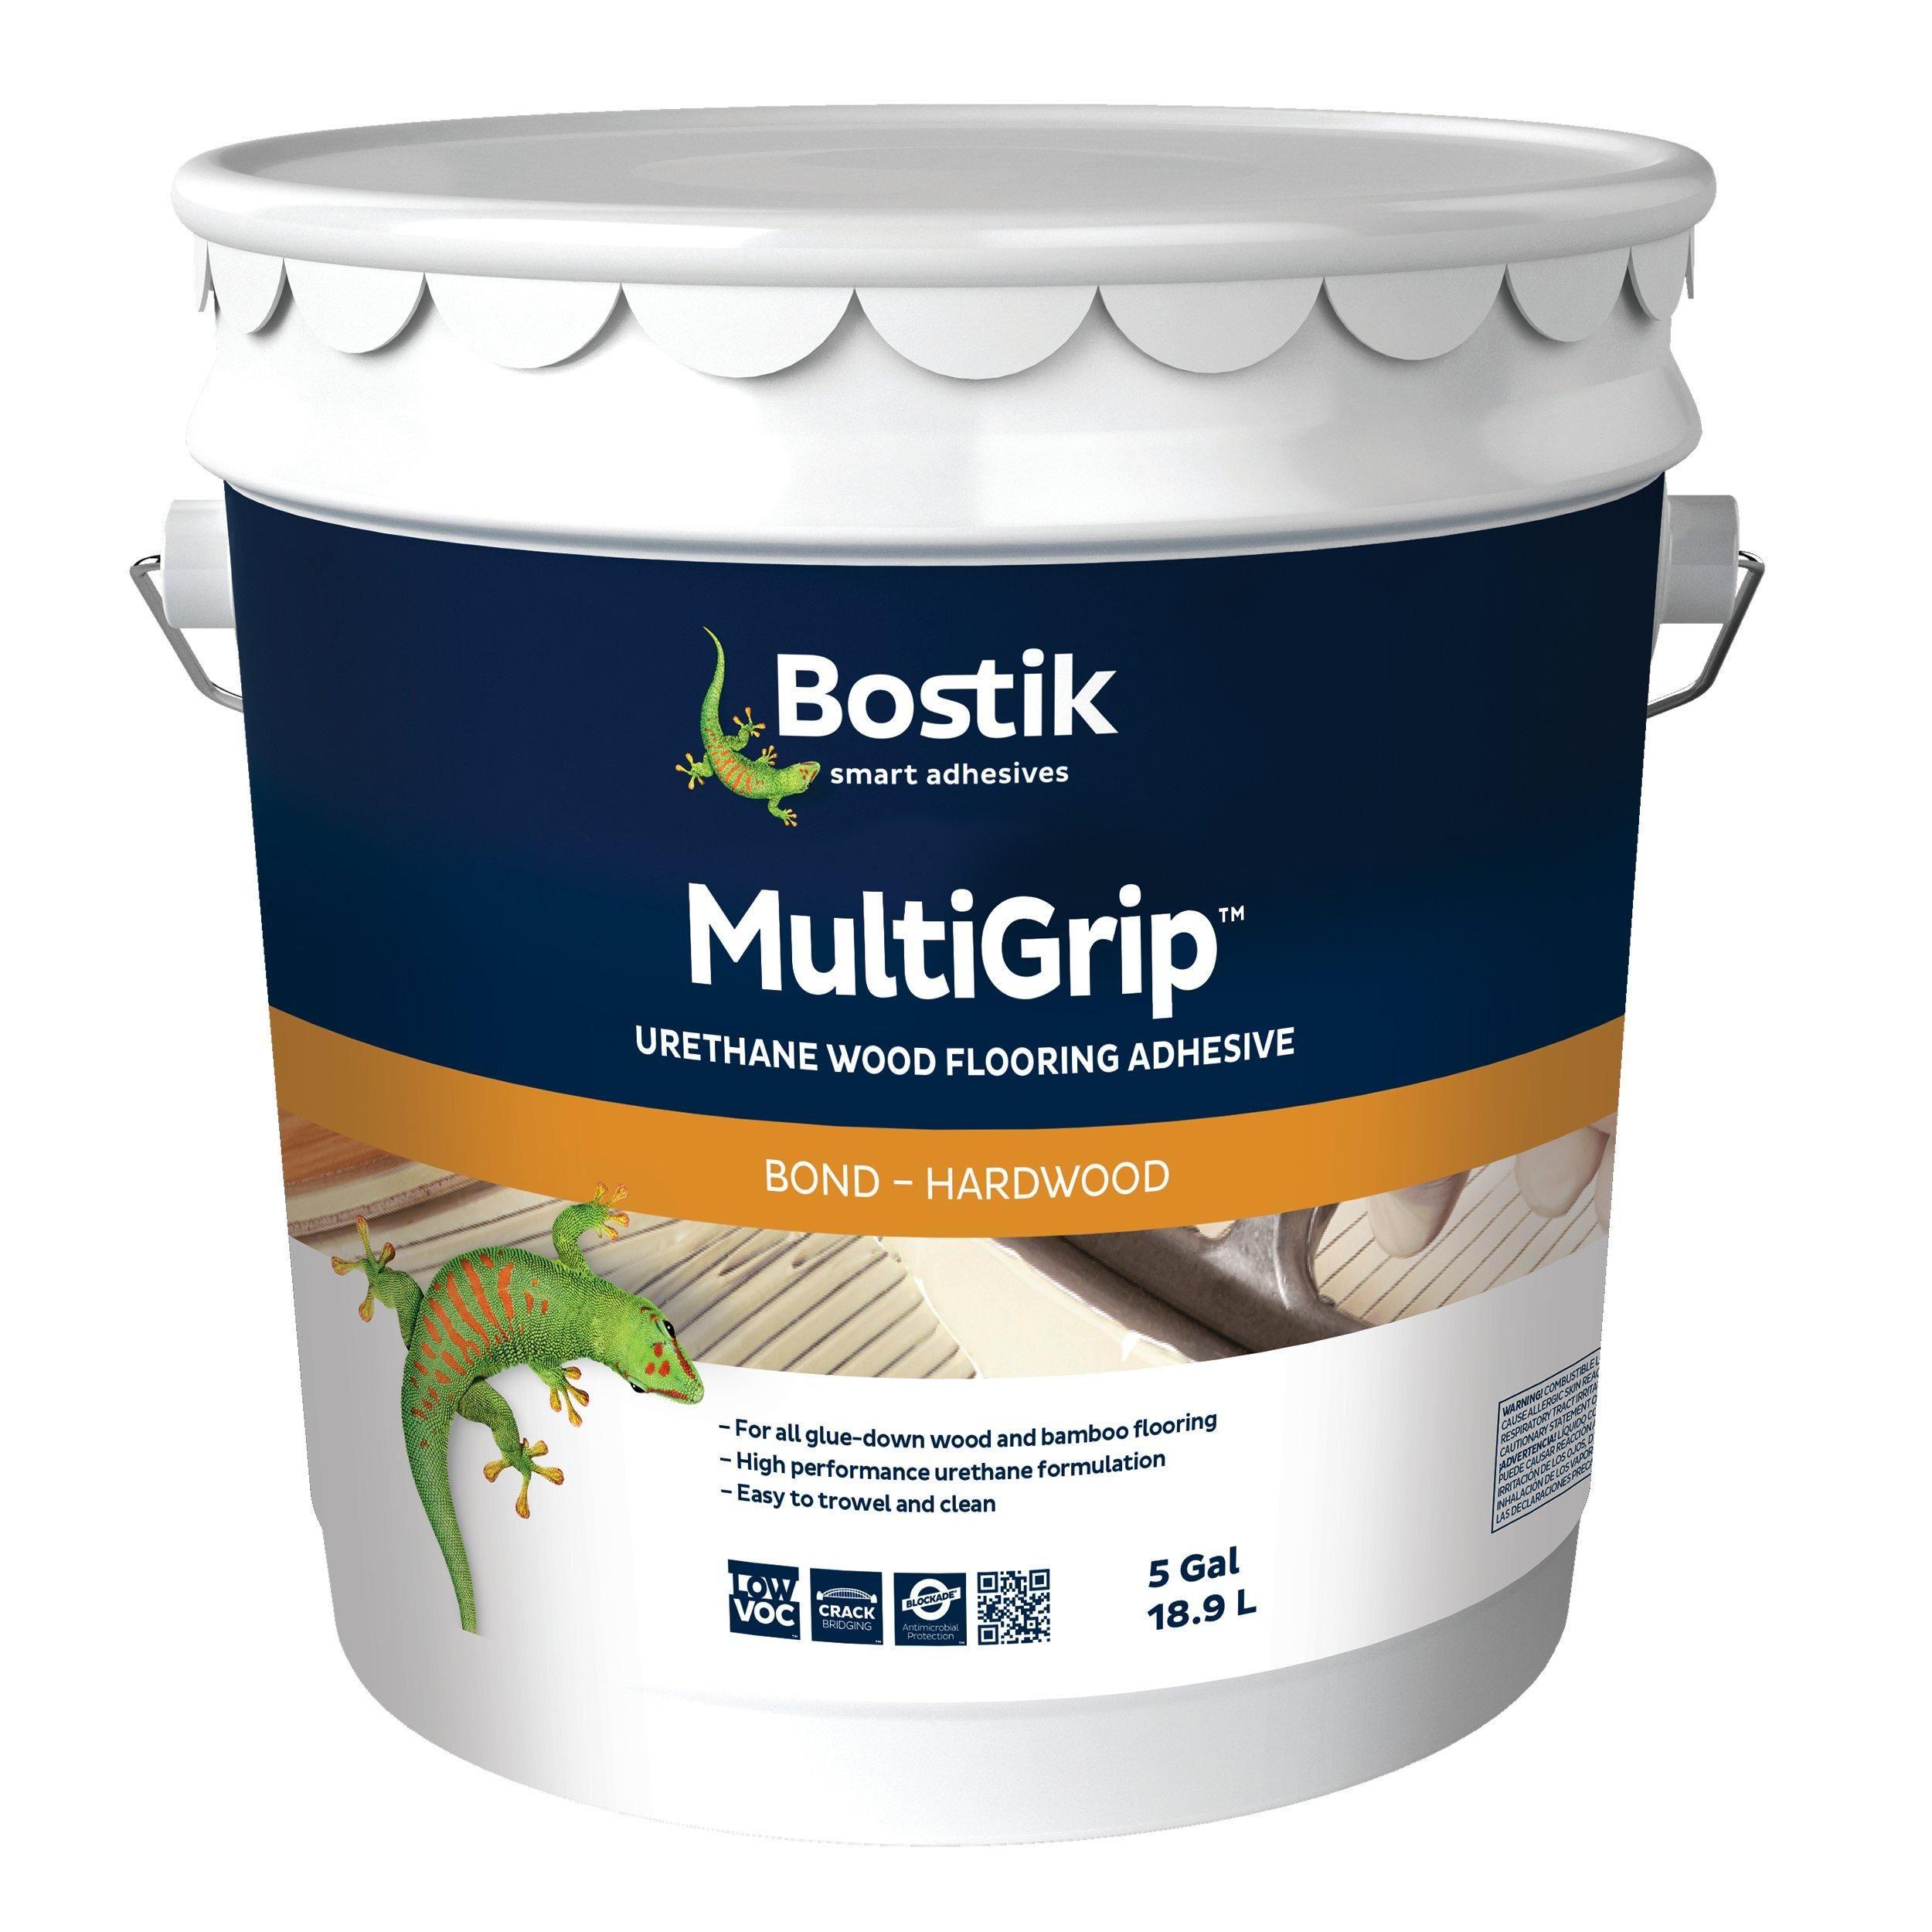 Bostik Multigrip Urethane Wood Flooring